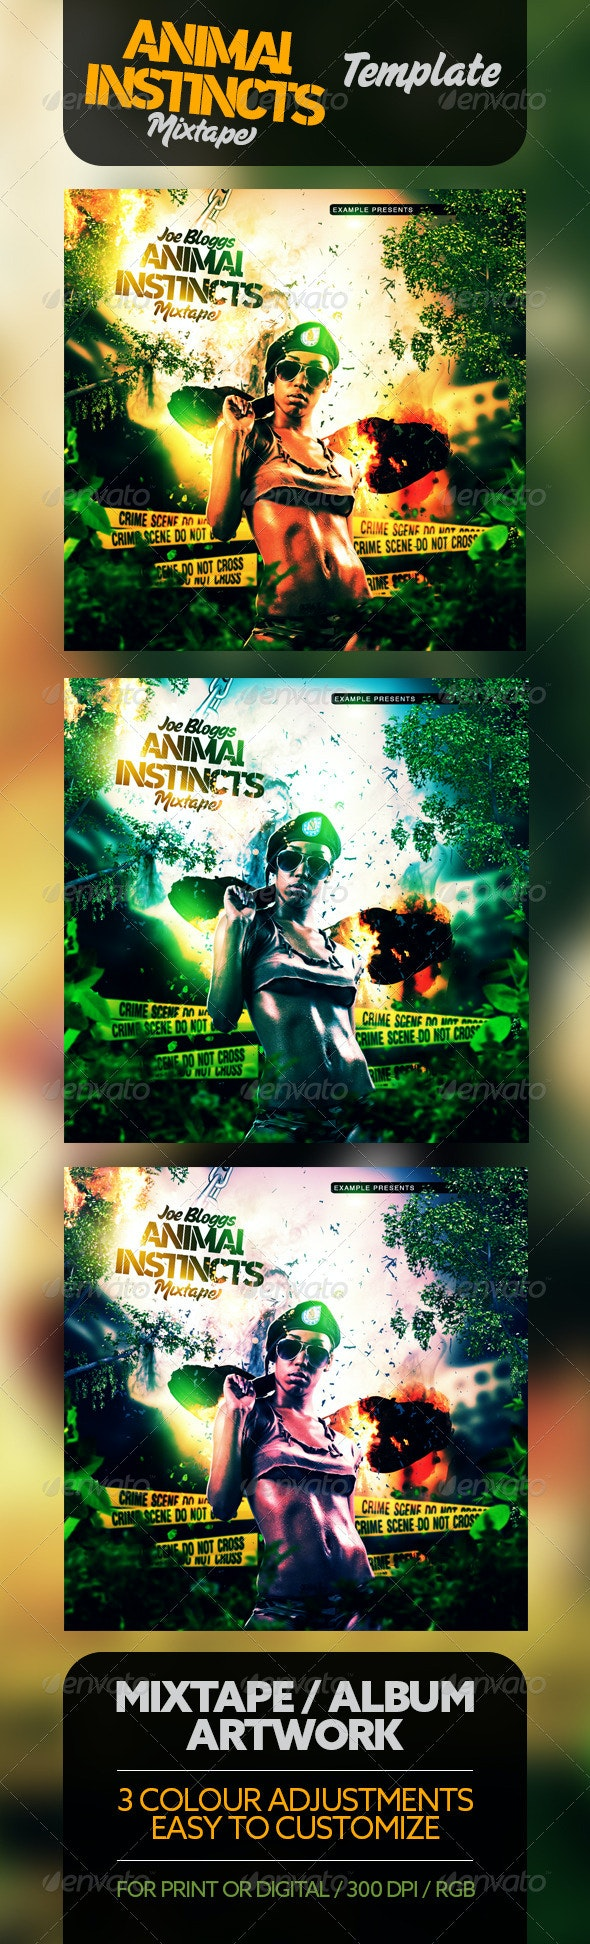 Animal Instincts Mixtape / CD Template - CD & DVD Artwork Print Templates